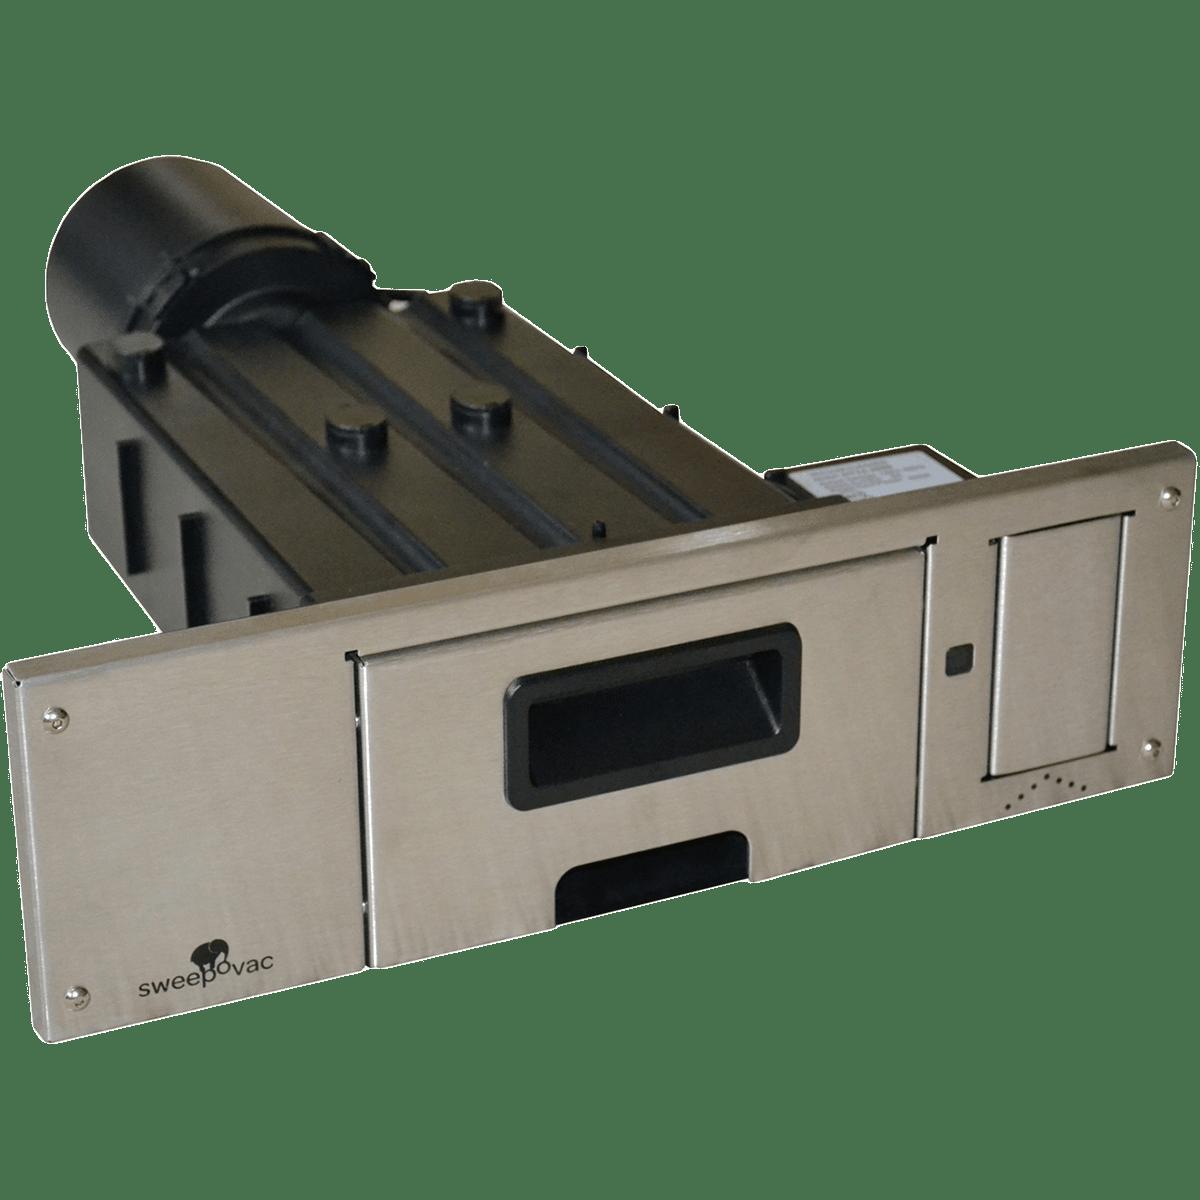 Sweepovac SVS1500 Under Cabinet Kitchen Vacuum System